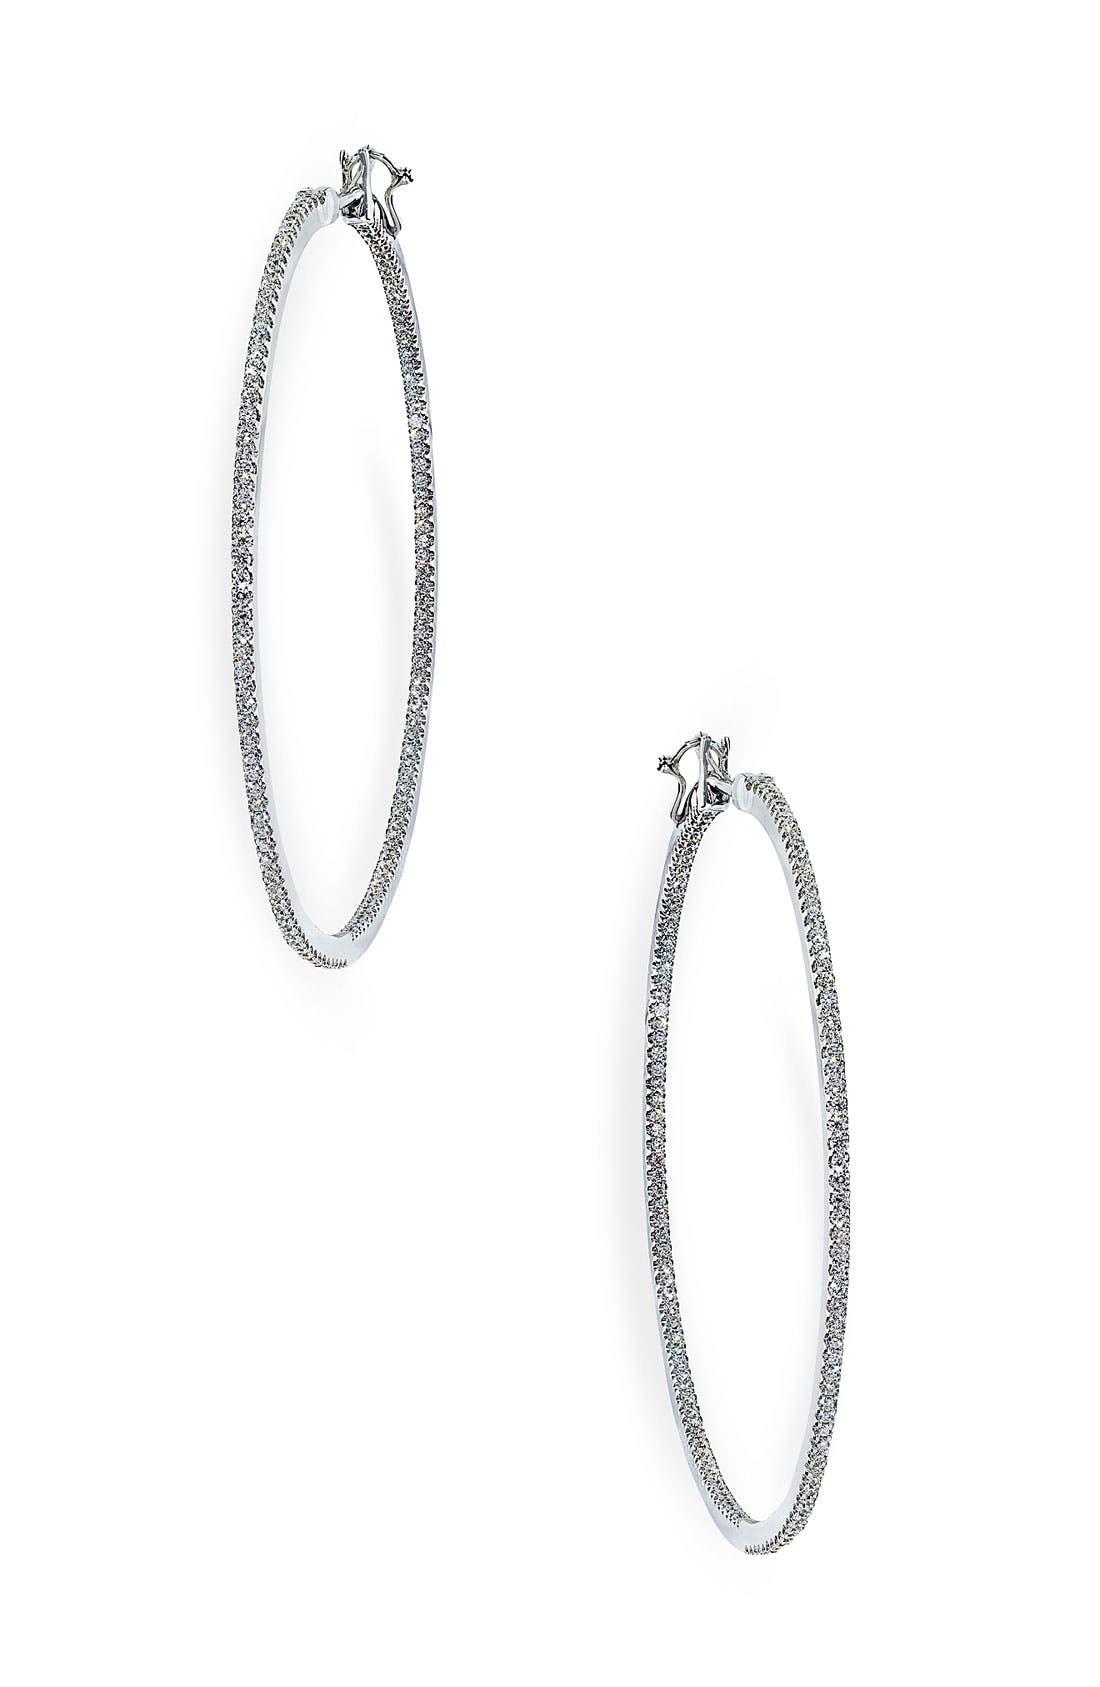 Alternate Image 1 Selected - Ivanka Trump 'Black & White' Medium Thin Diamond Hoop Earrings